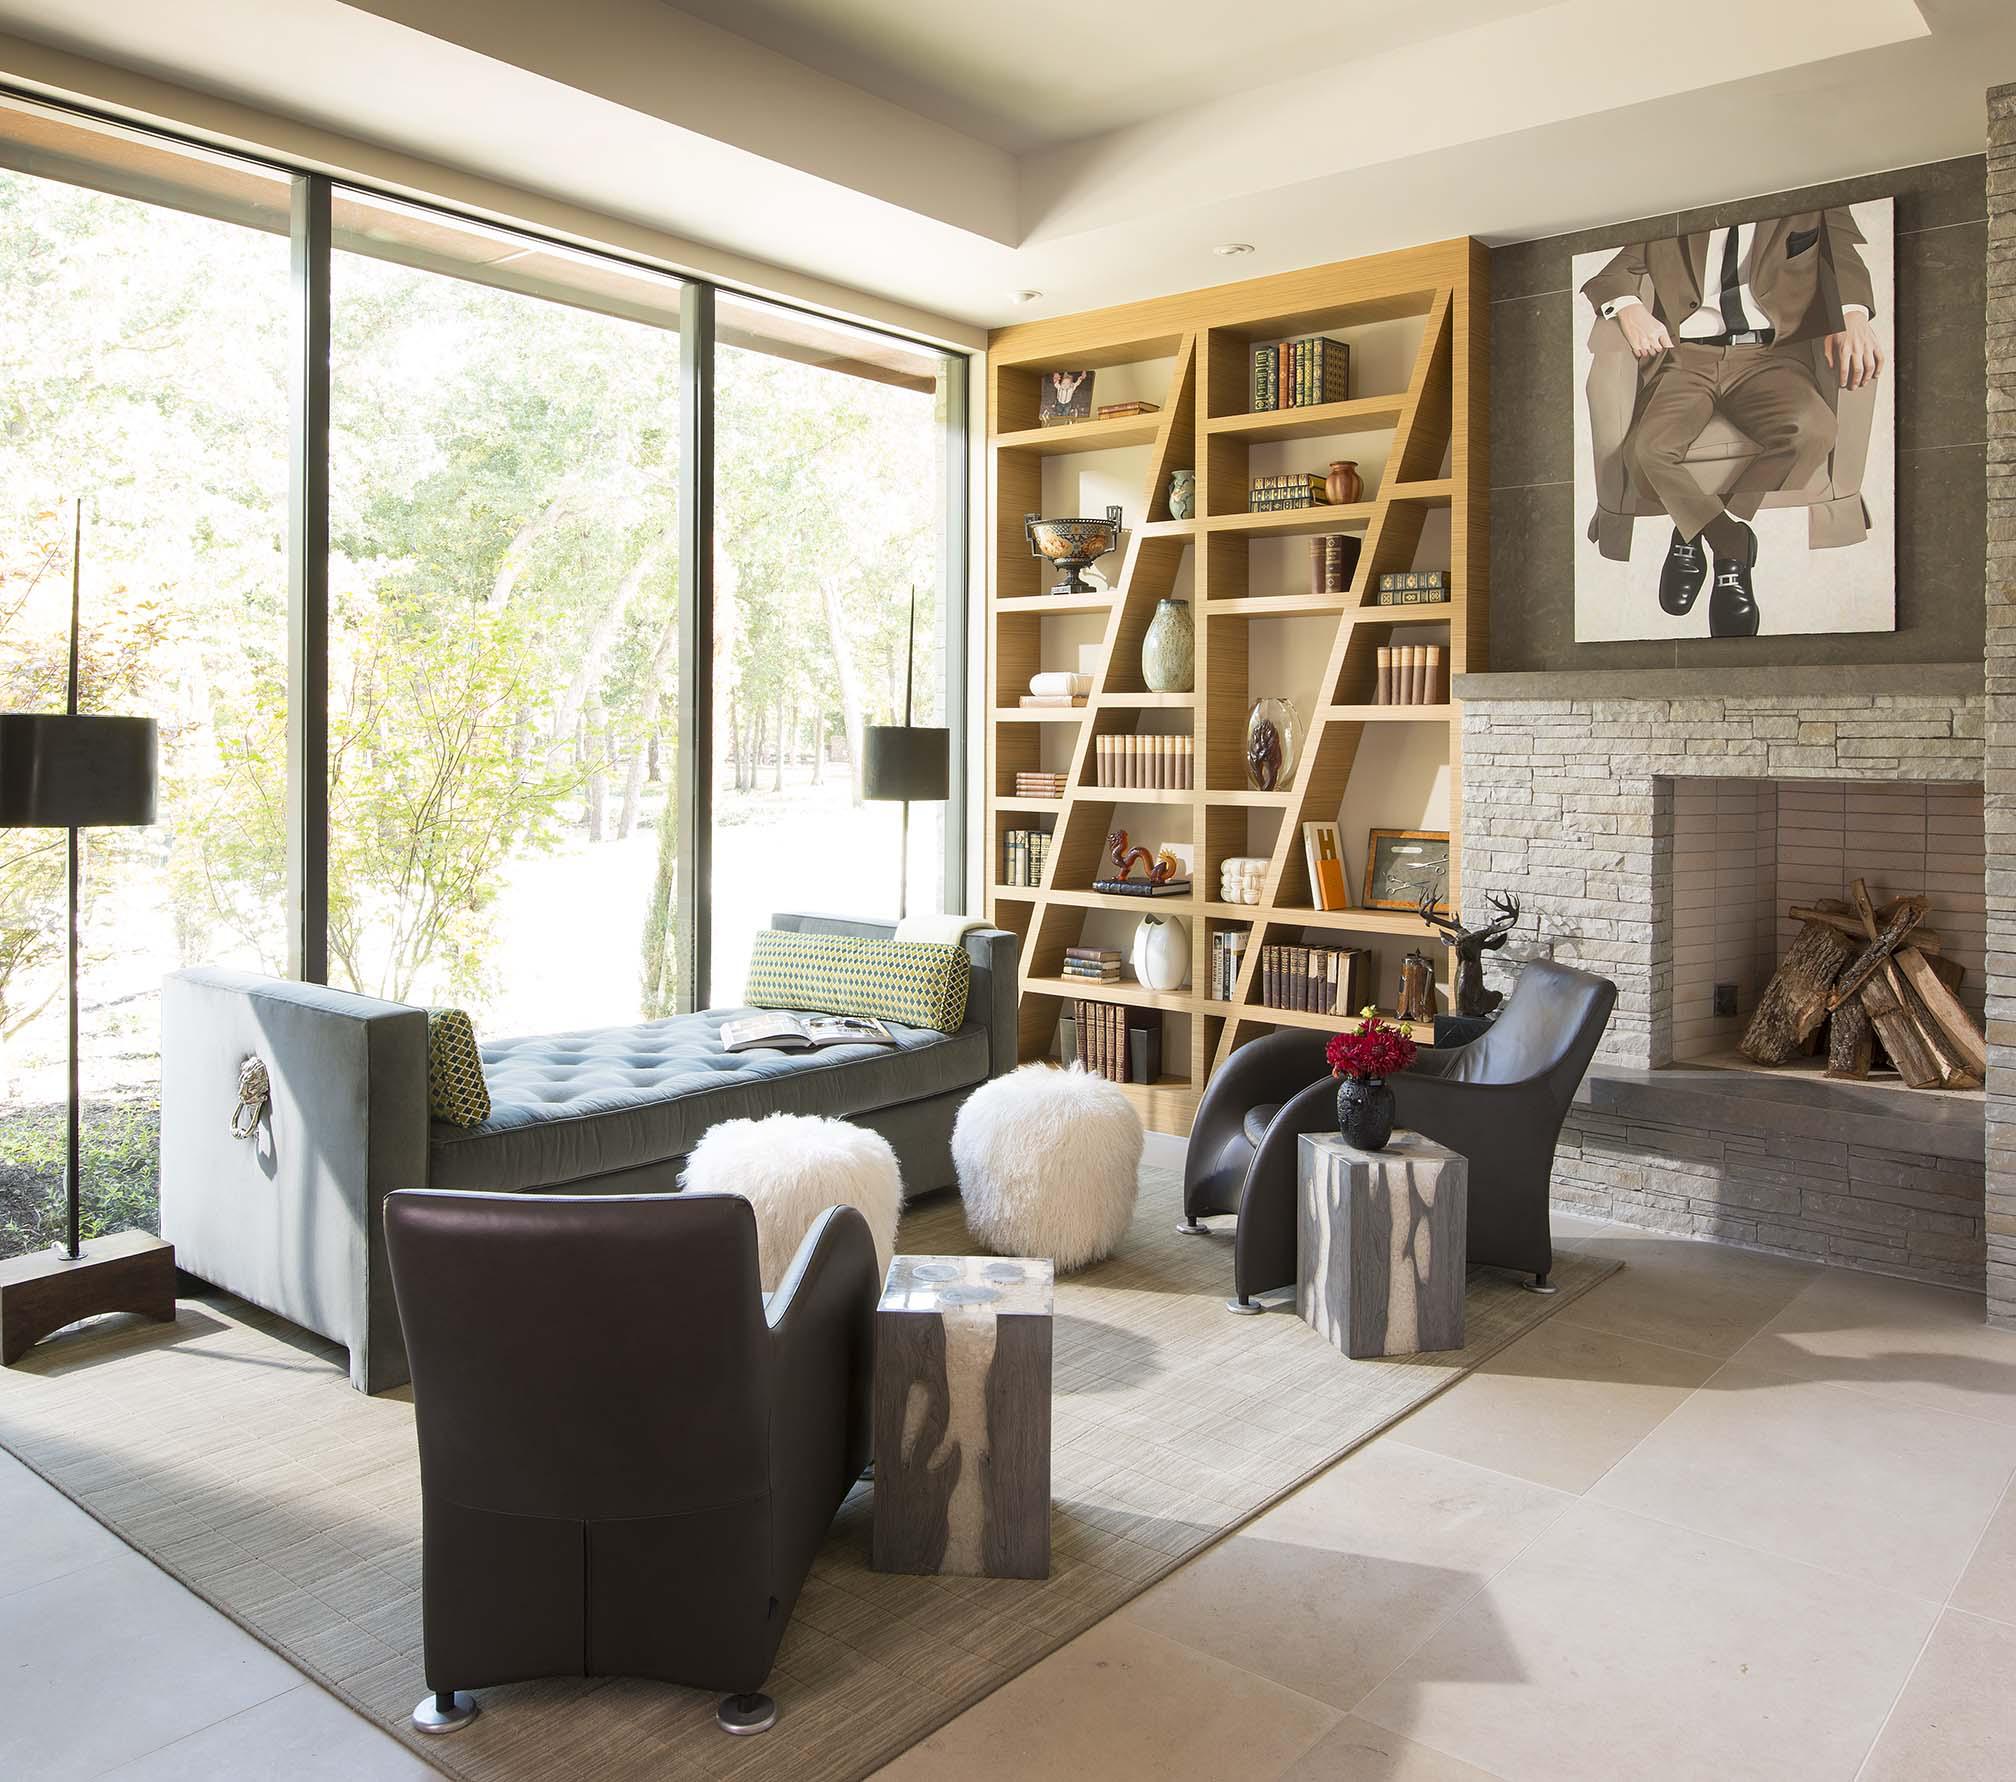 Interior design by Denise McGaha Interiors